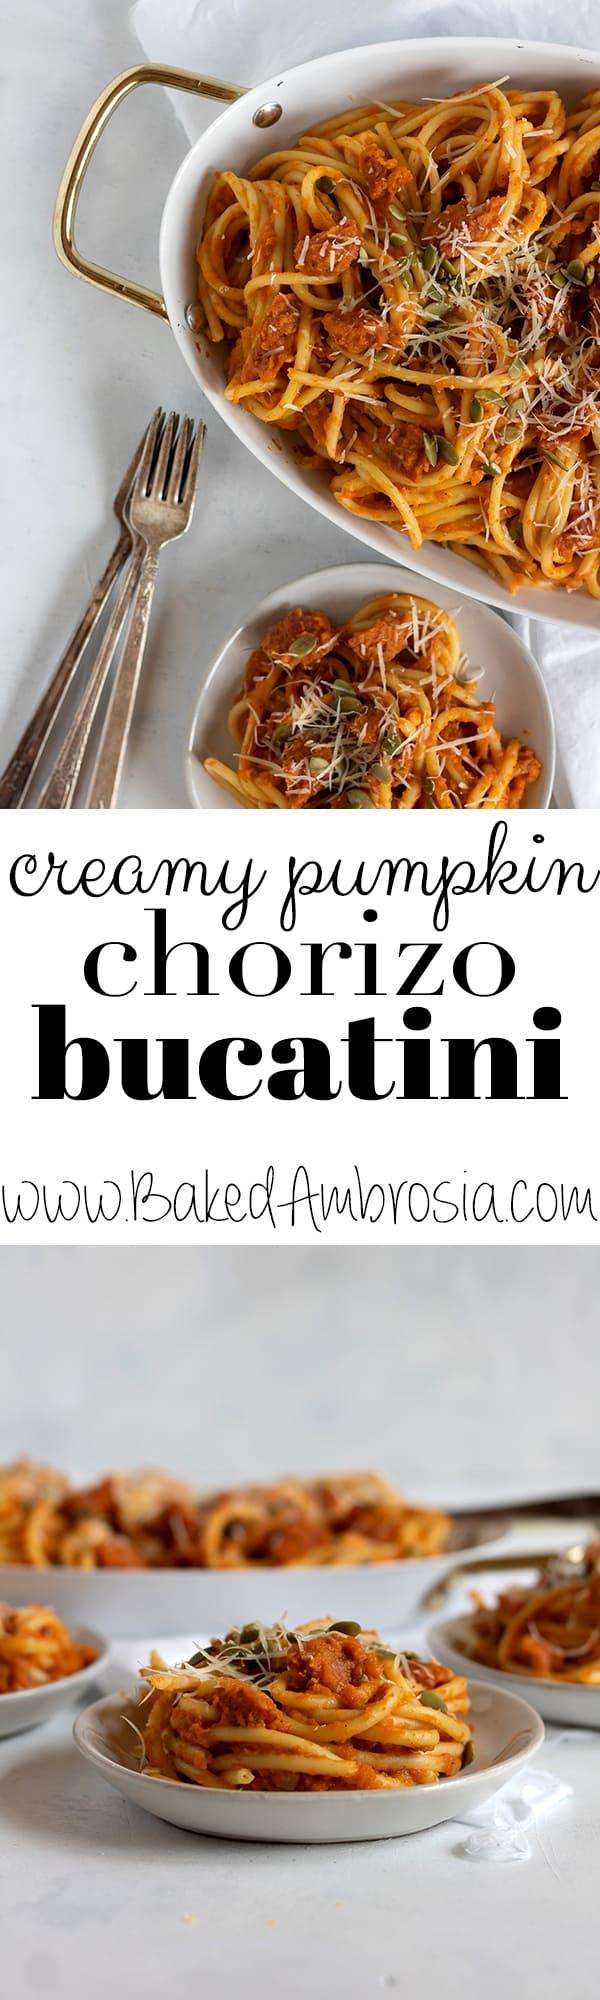 Creamy Pumpkin Chorizo Bucatini